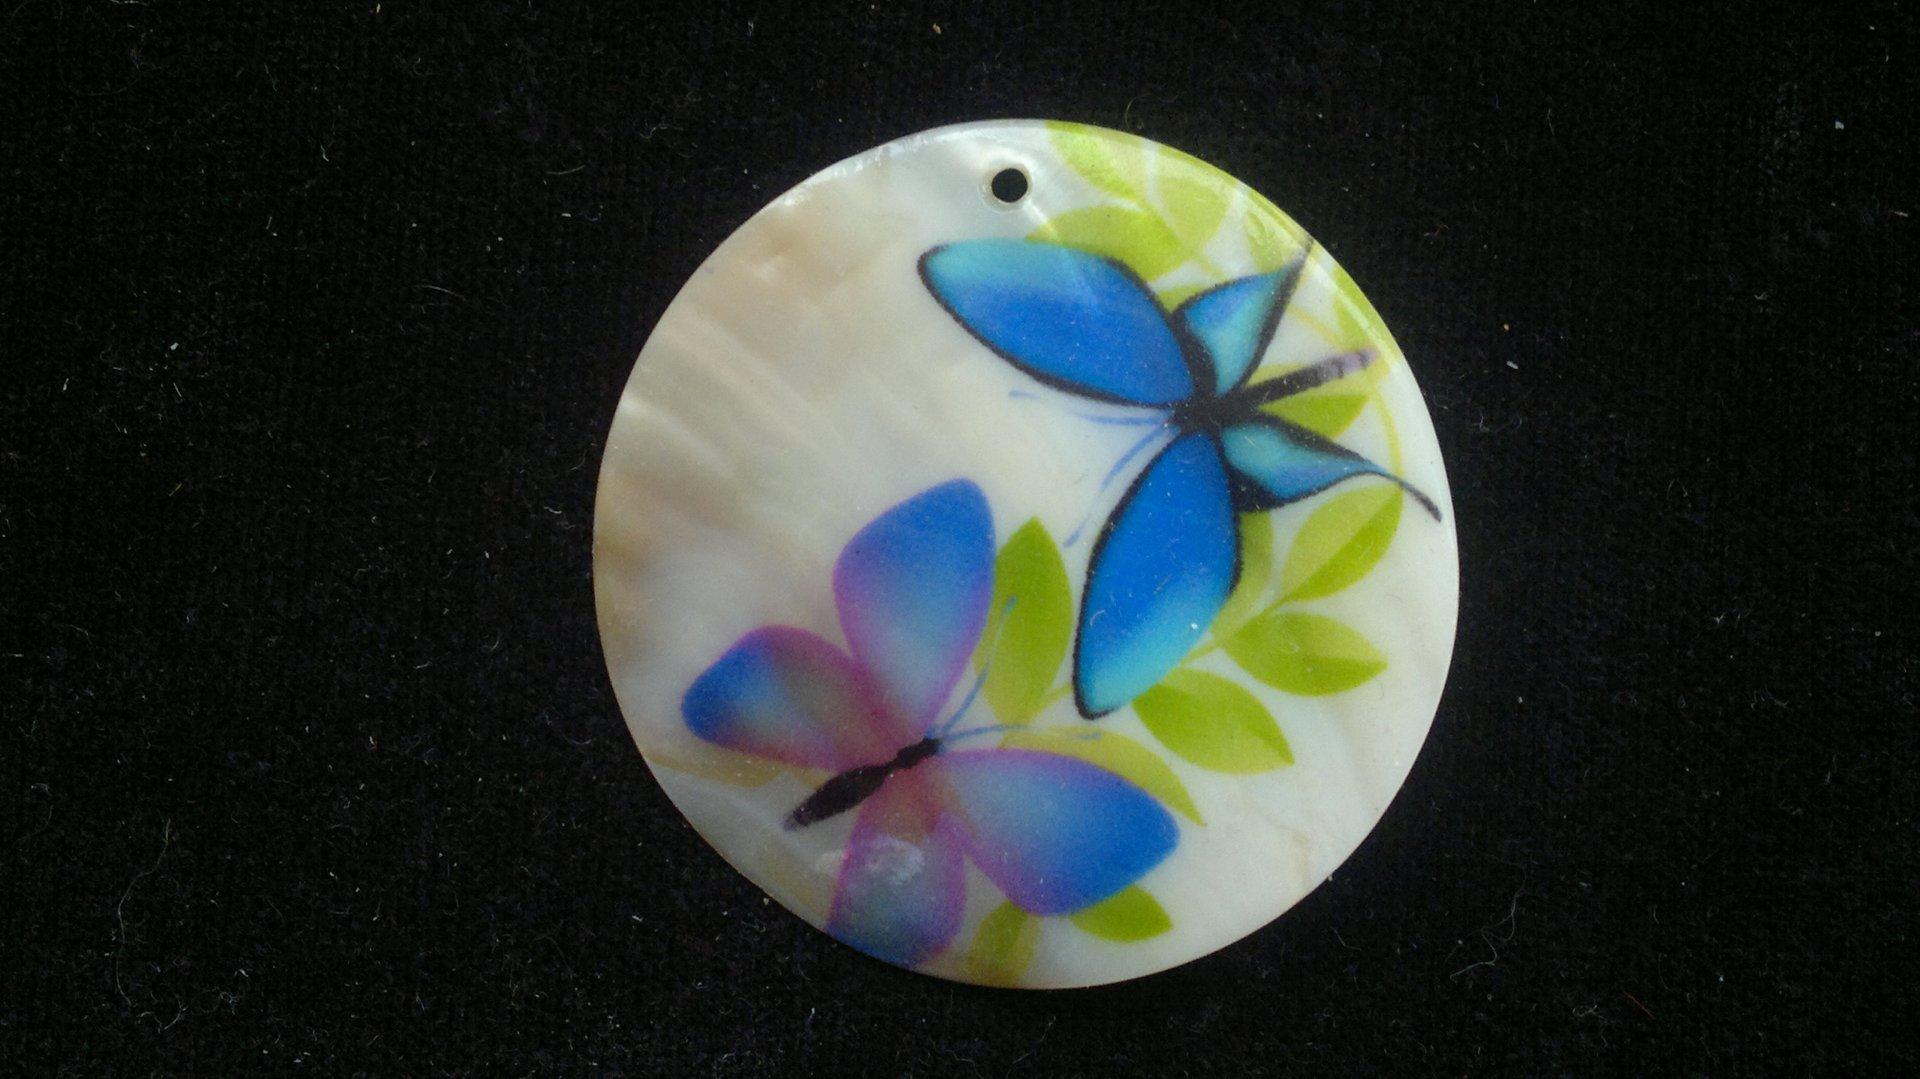 Silná perleť 50 mm - motiv 8 perleť 50 mm 1,2 mm bílá/modrá/zelená/černá/fialová